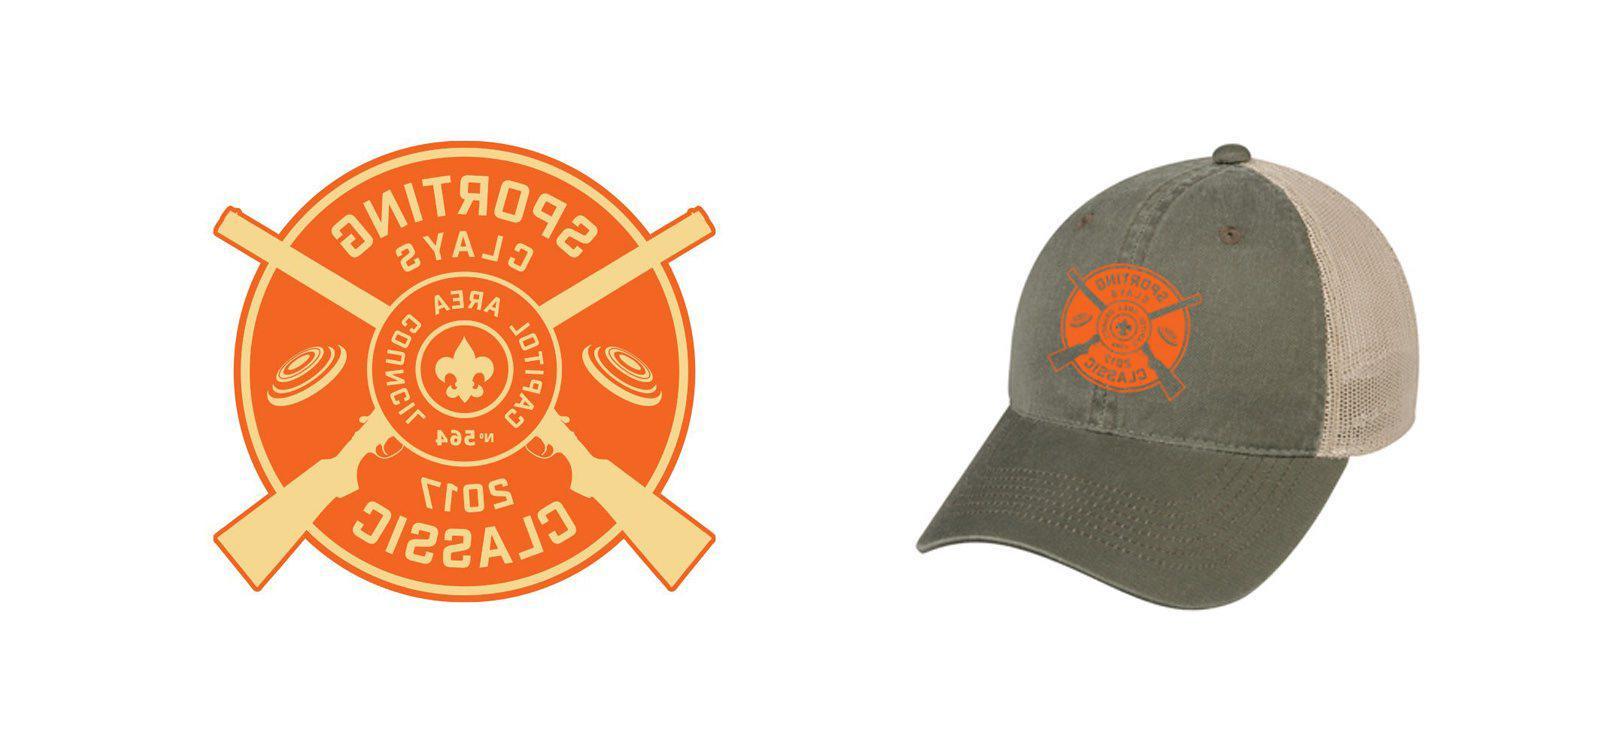 2017 Clayshoot的logo和帽子伟德平台注册